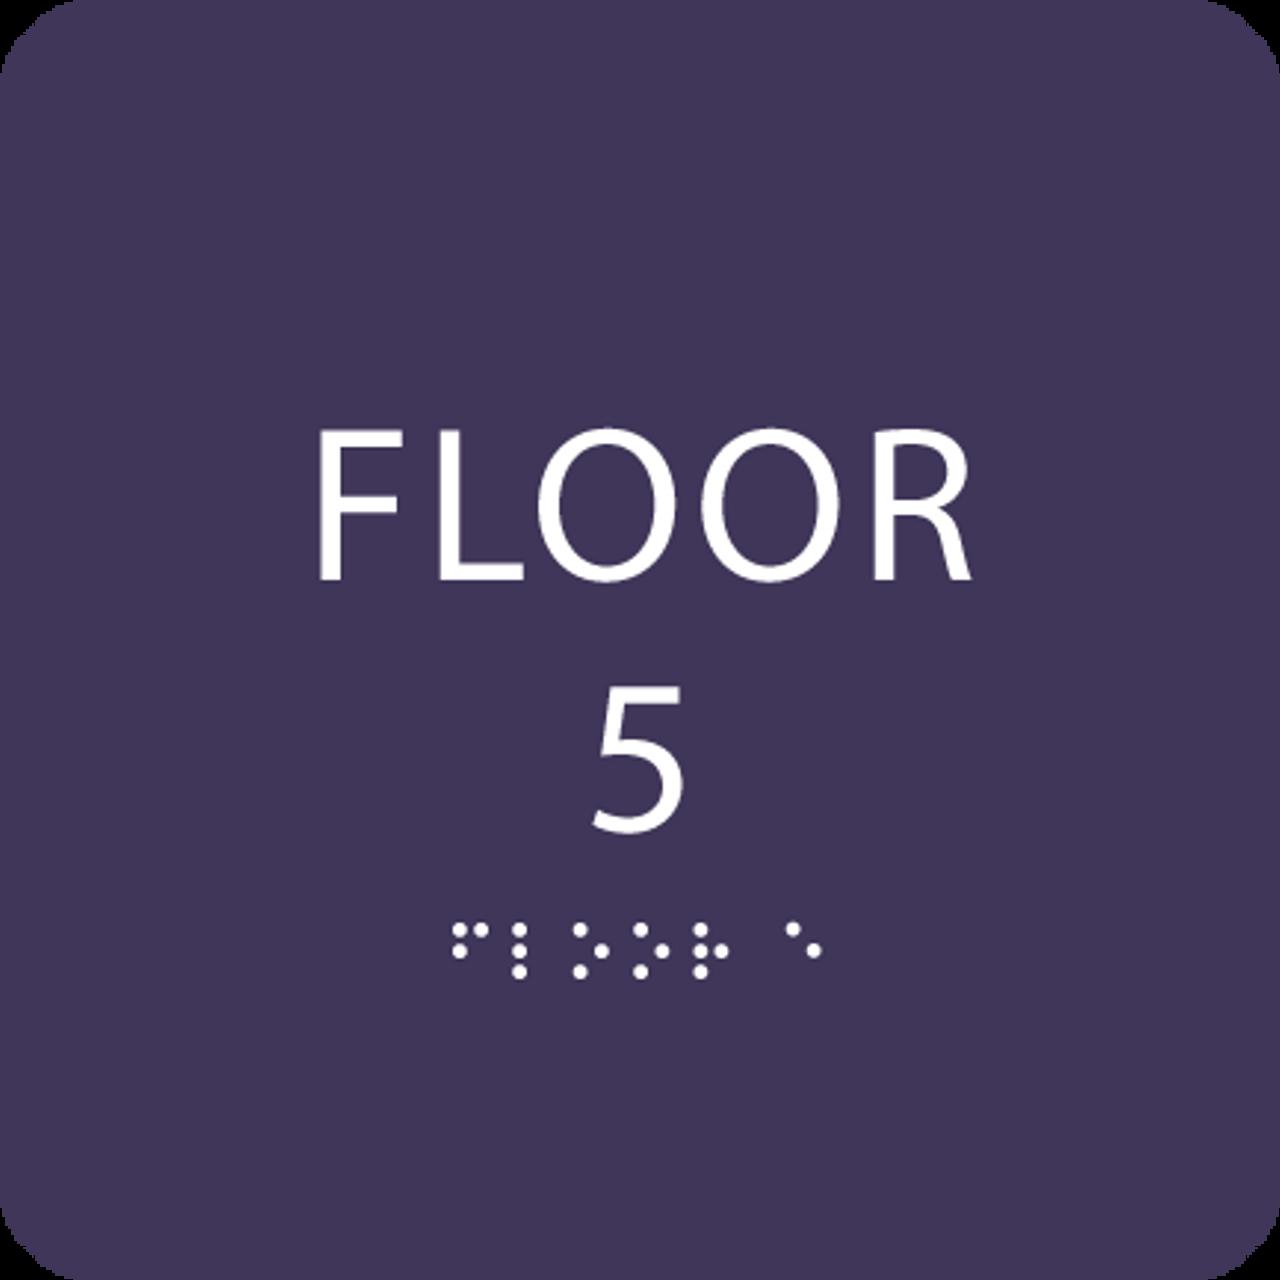 Purple Floor 5 Level Identification Sign